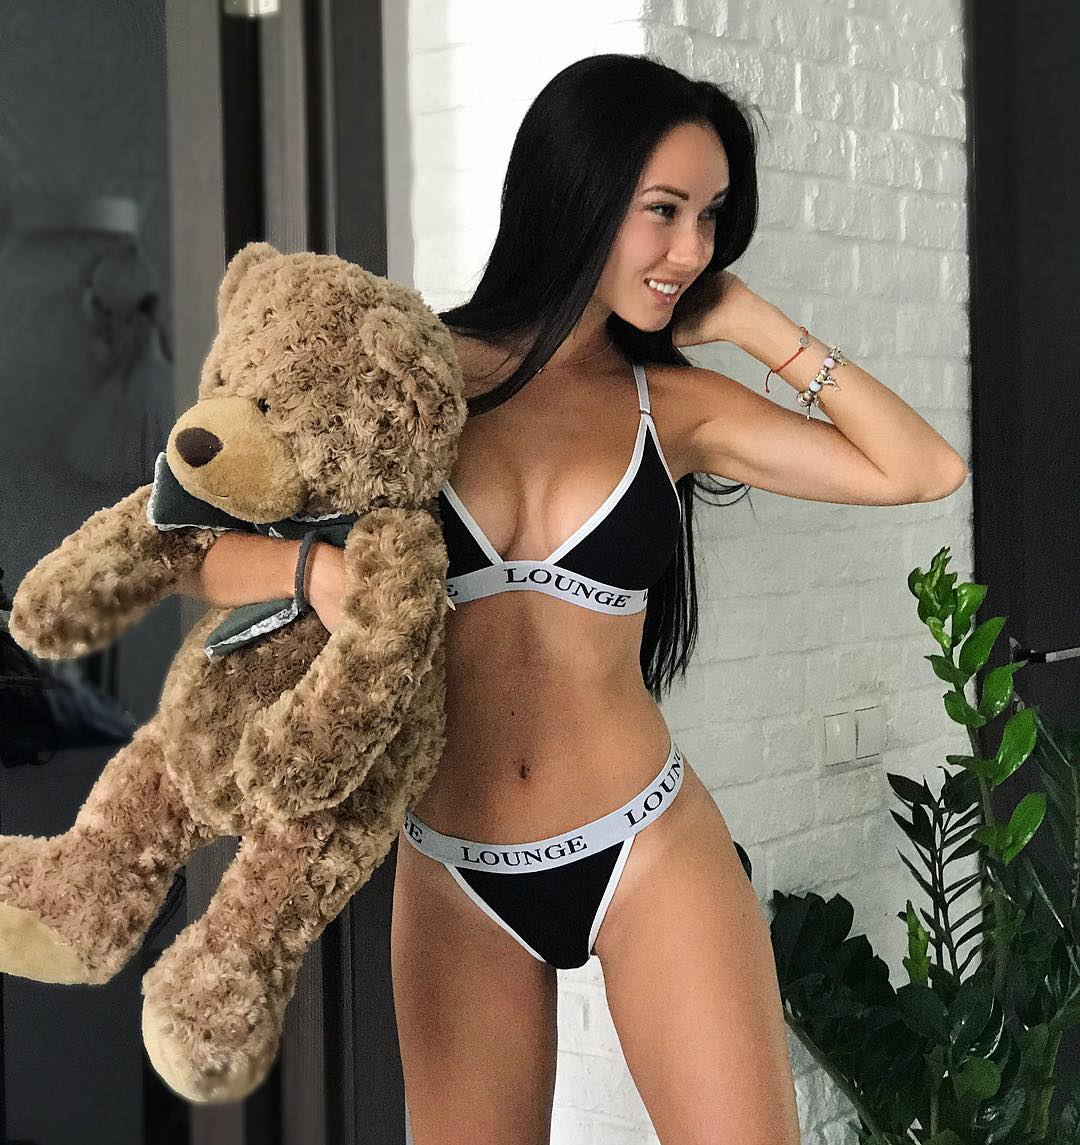 Pictures Nina Serebrova naked (49 photo), Tits, Bikini, Selfie, swimsuit 2015